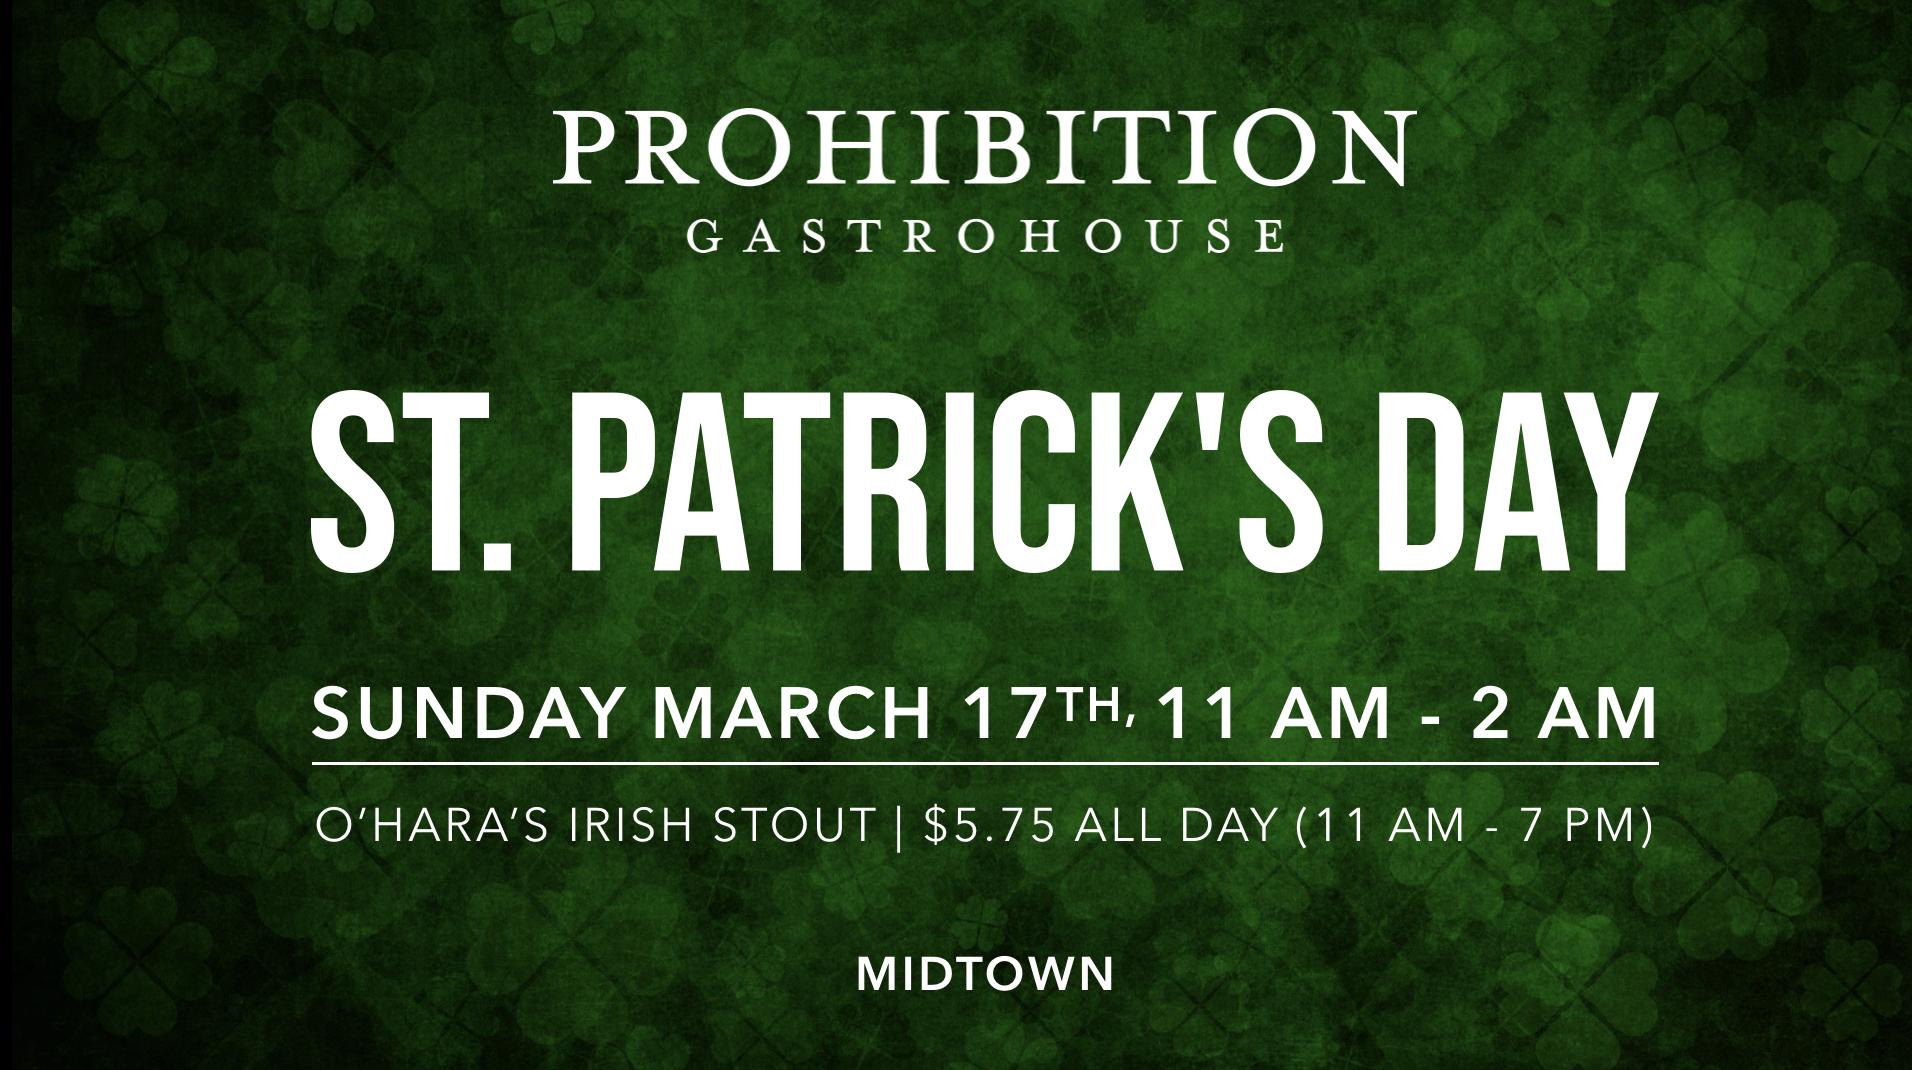 Prohibition Gastrohouse St. Patrick's Day 2019